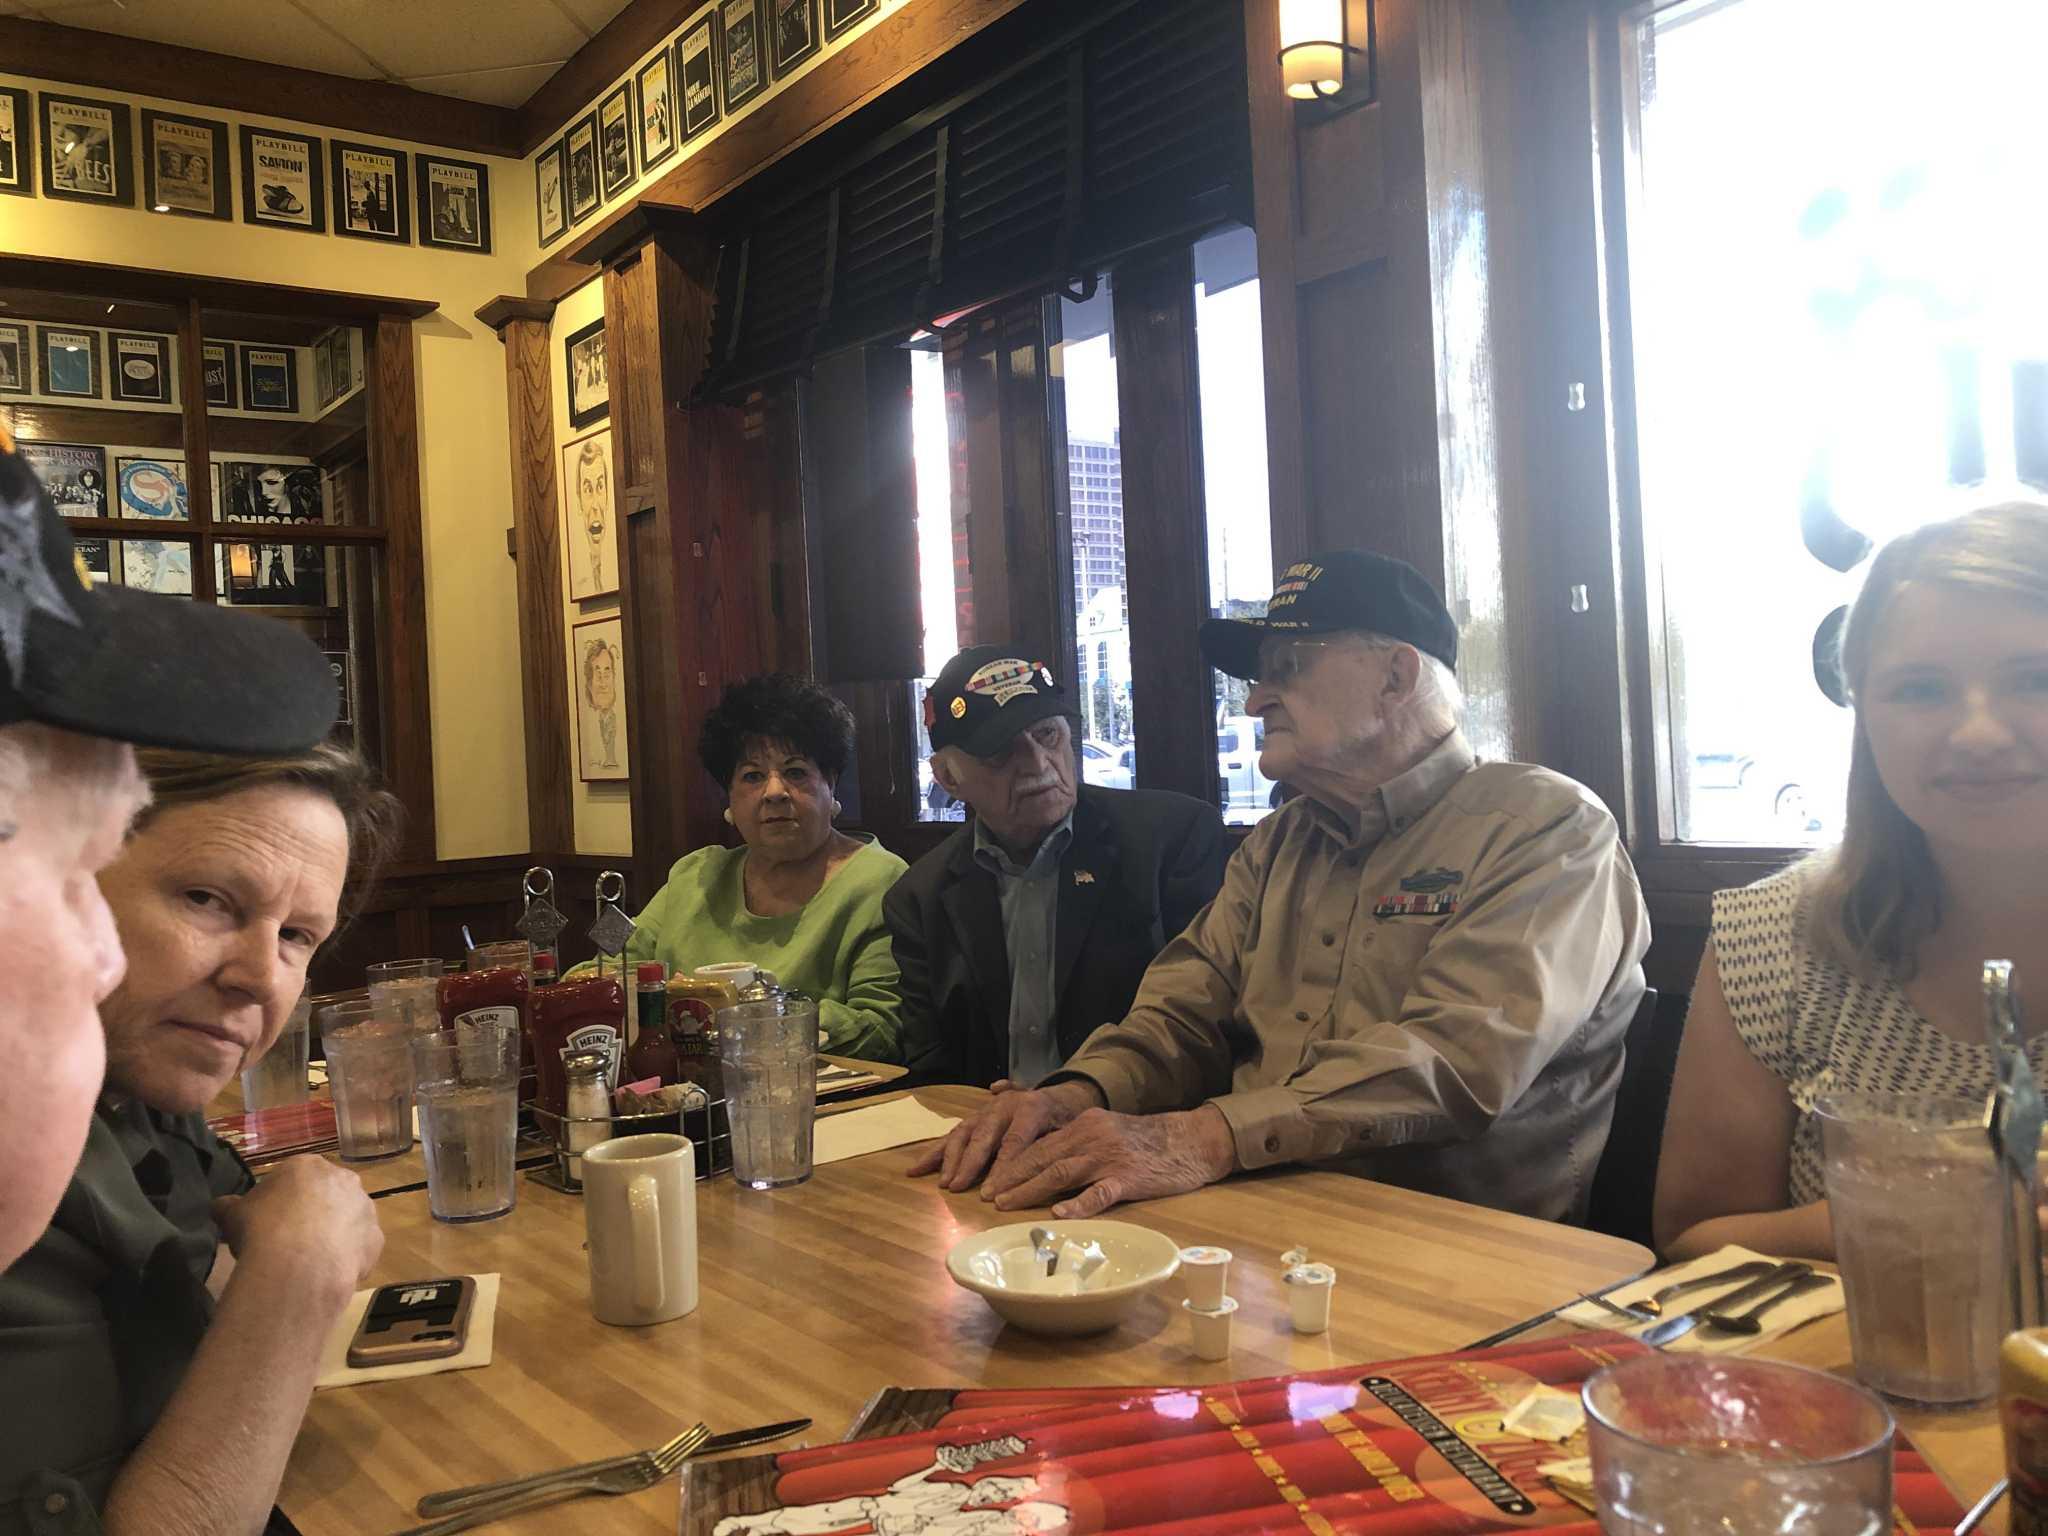 Holocaust survivors, liberators share stories at Kenny & Ziggy's